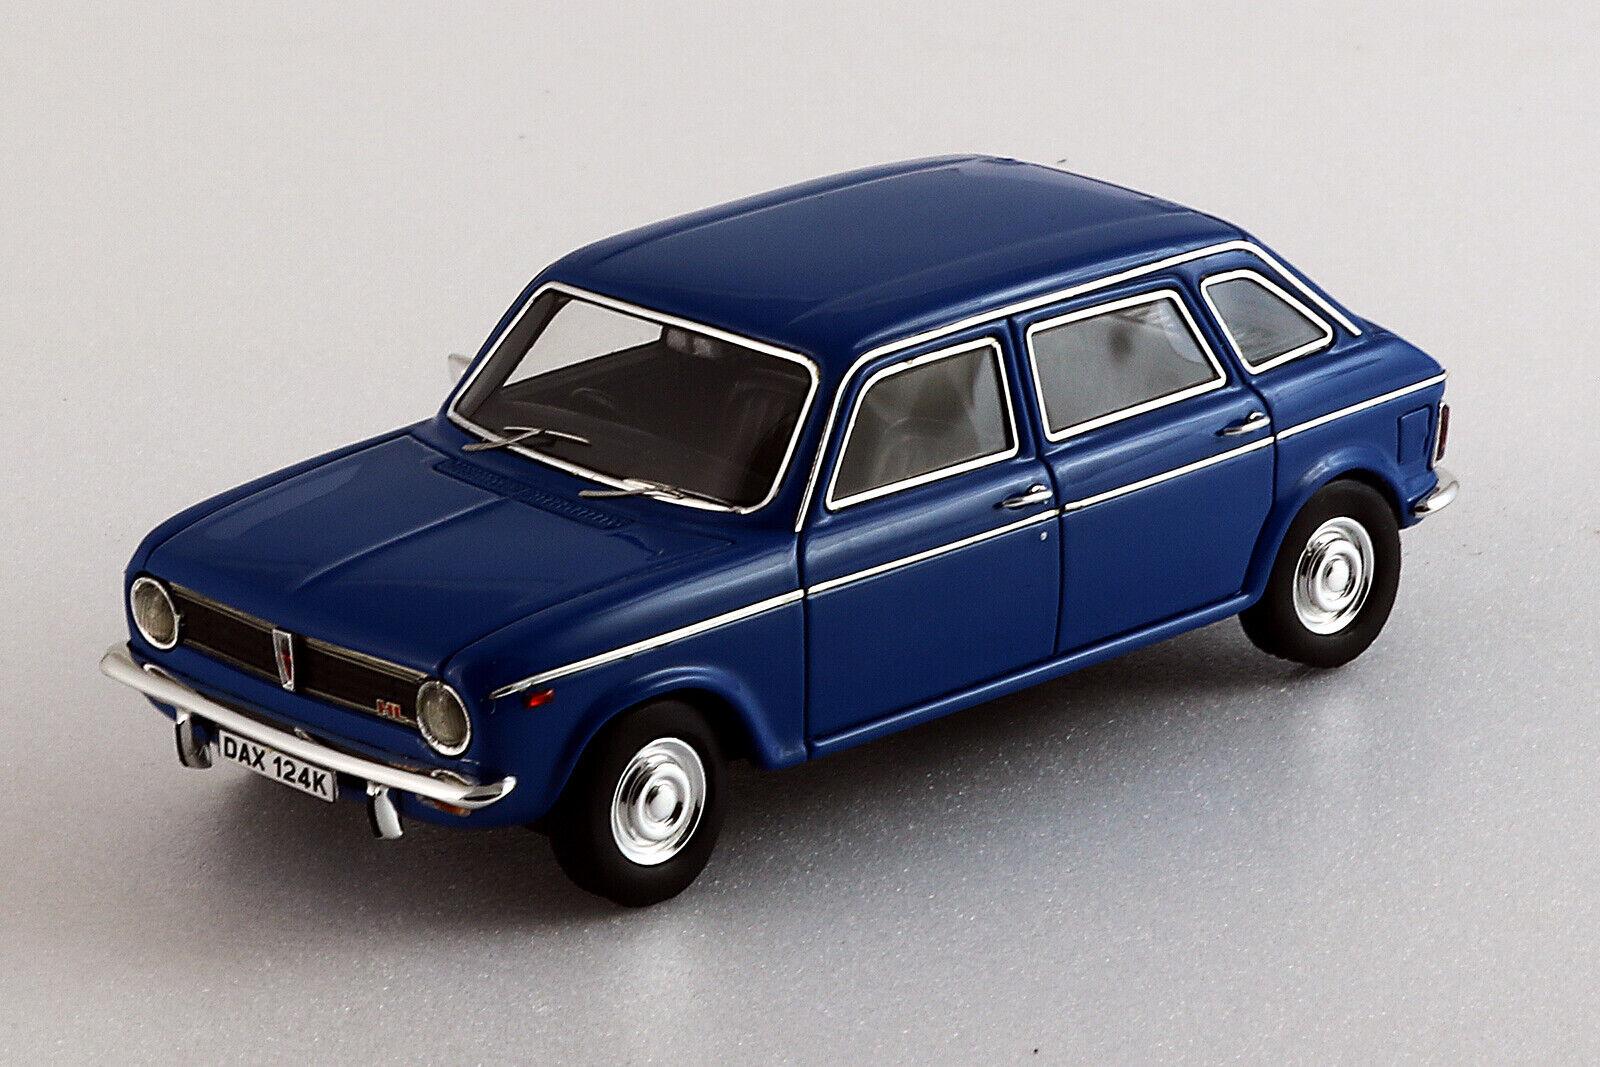 Austin Maxi 1750HL (1972) Teal Blau - Silas Modells - 1 43ème -  SM43041.tb